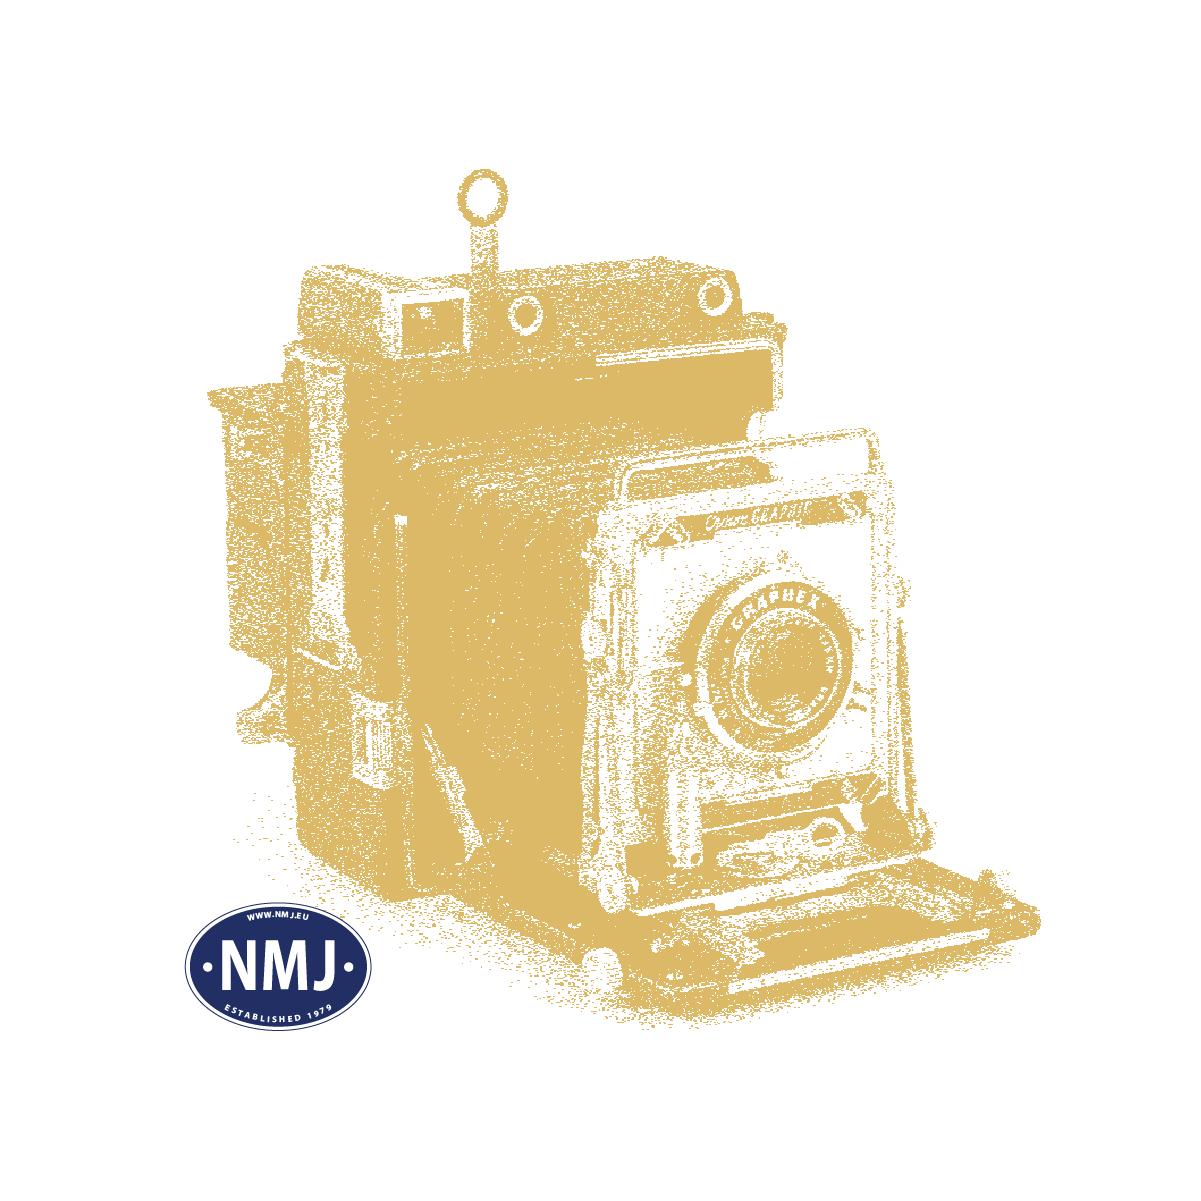 NMJT90014 - NMJ Topline NSB Di3a 620, Gammeldesign, DC